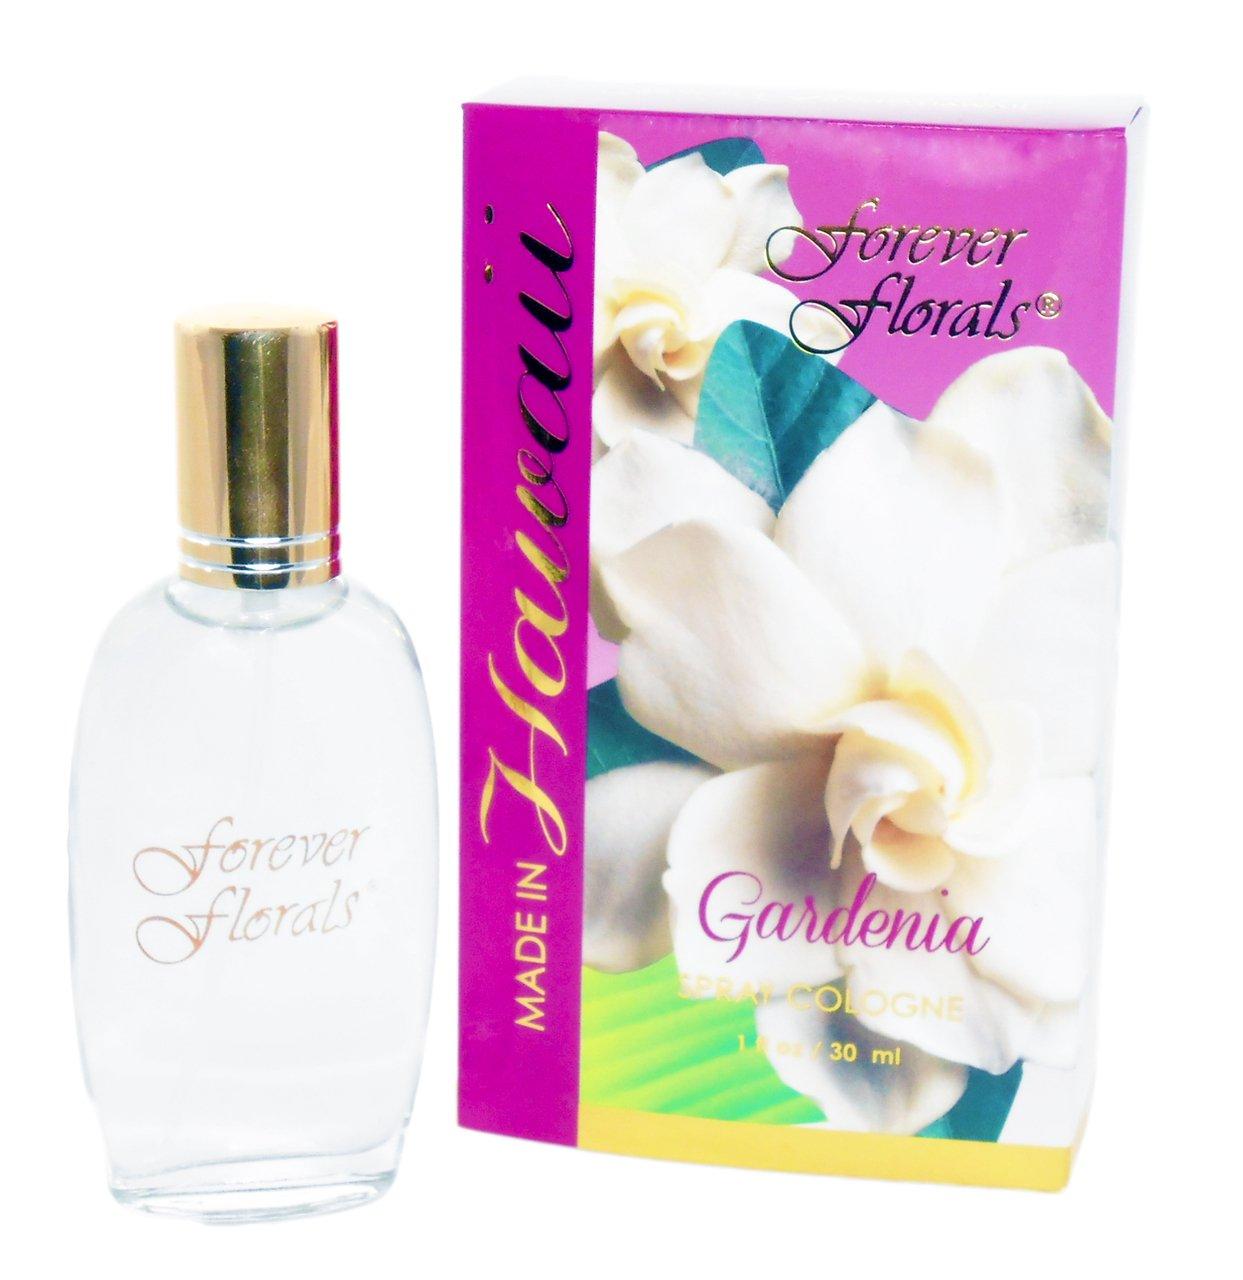 Amazon Hawaii Forever Florals Gardenia Spray Cologne